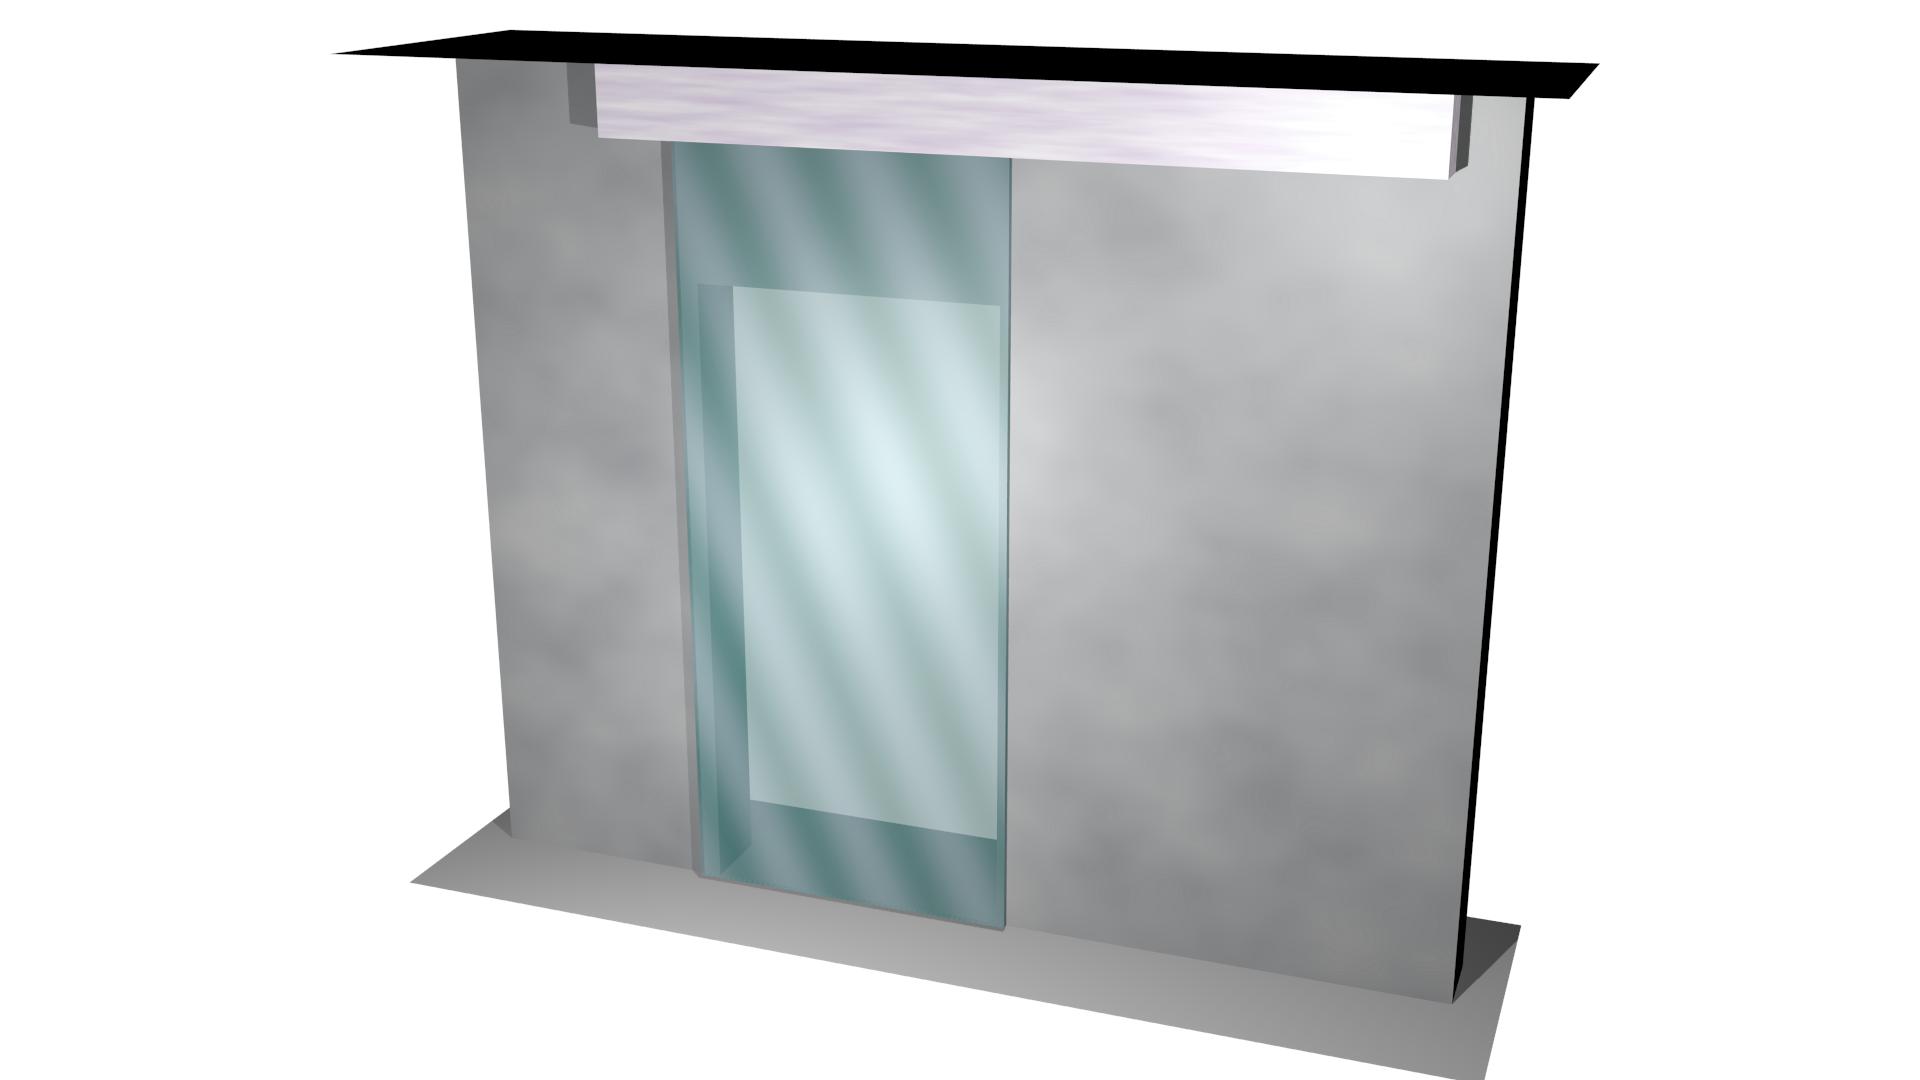 glas bach shop konfigurator f r schiebesysteme. Black Bedroom Furniture Sets. Home Design Ideas